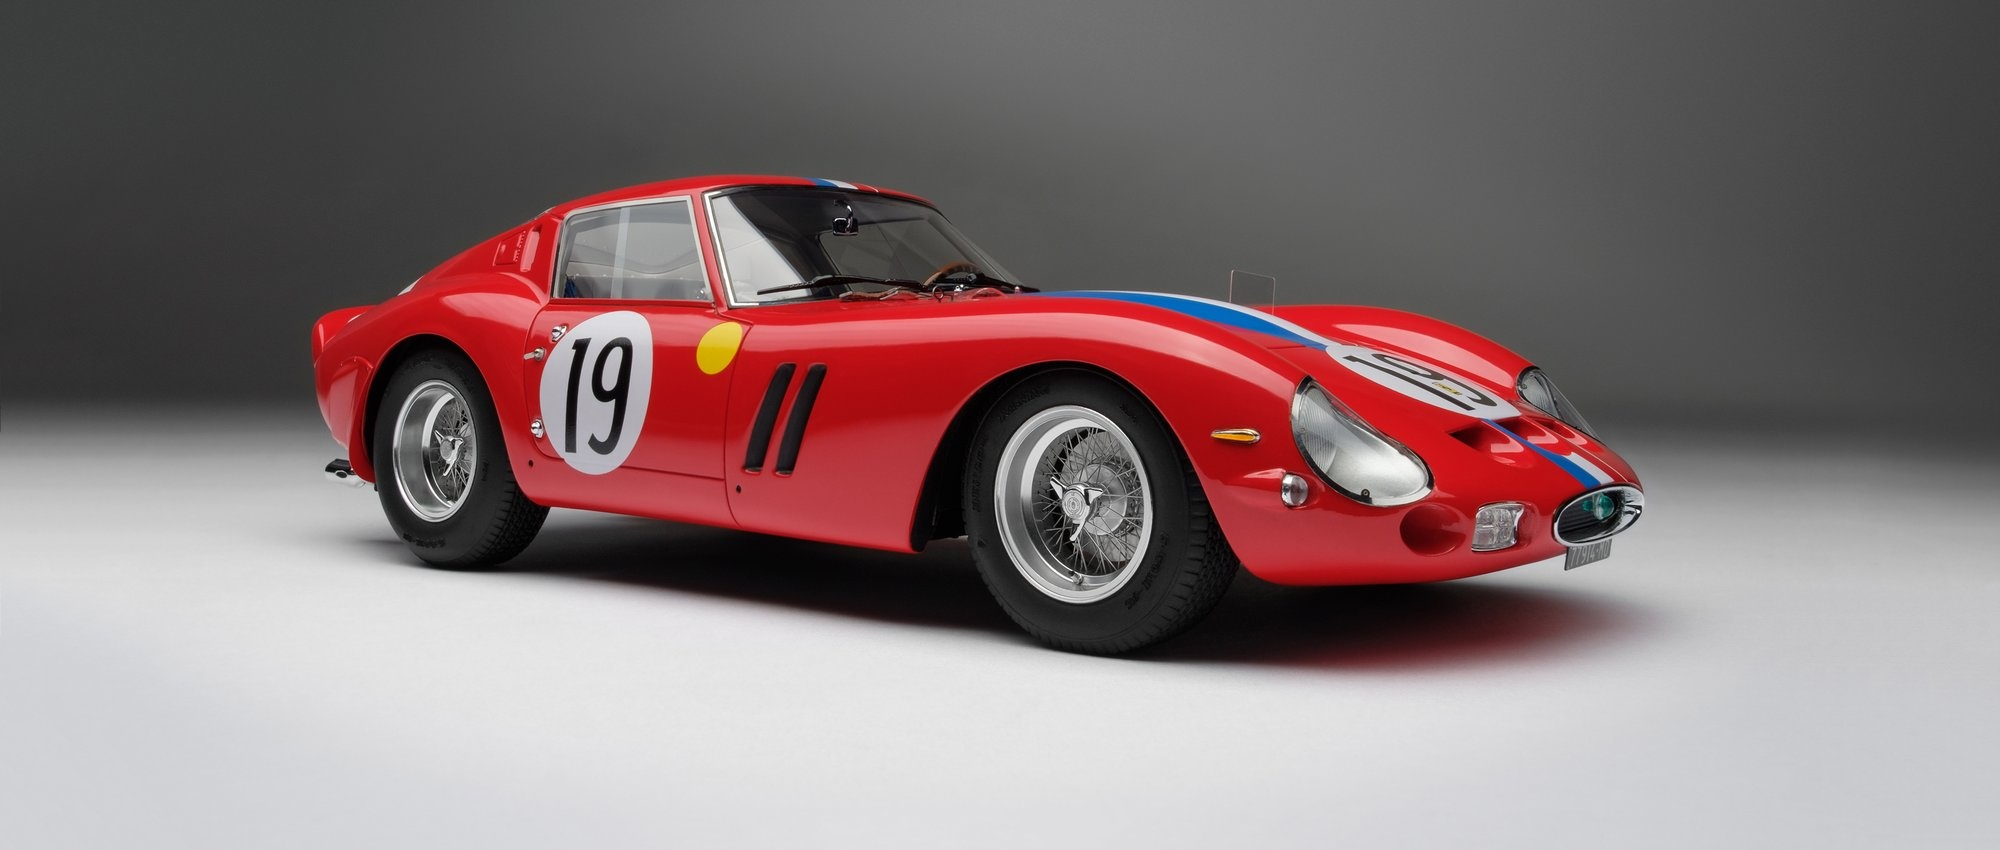 Amalgam Ferrari 250 GTO - 3705GT 1:18 - 1962 Le Mans Class Winner